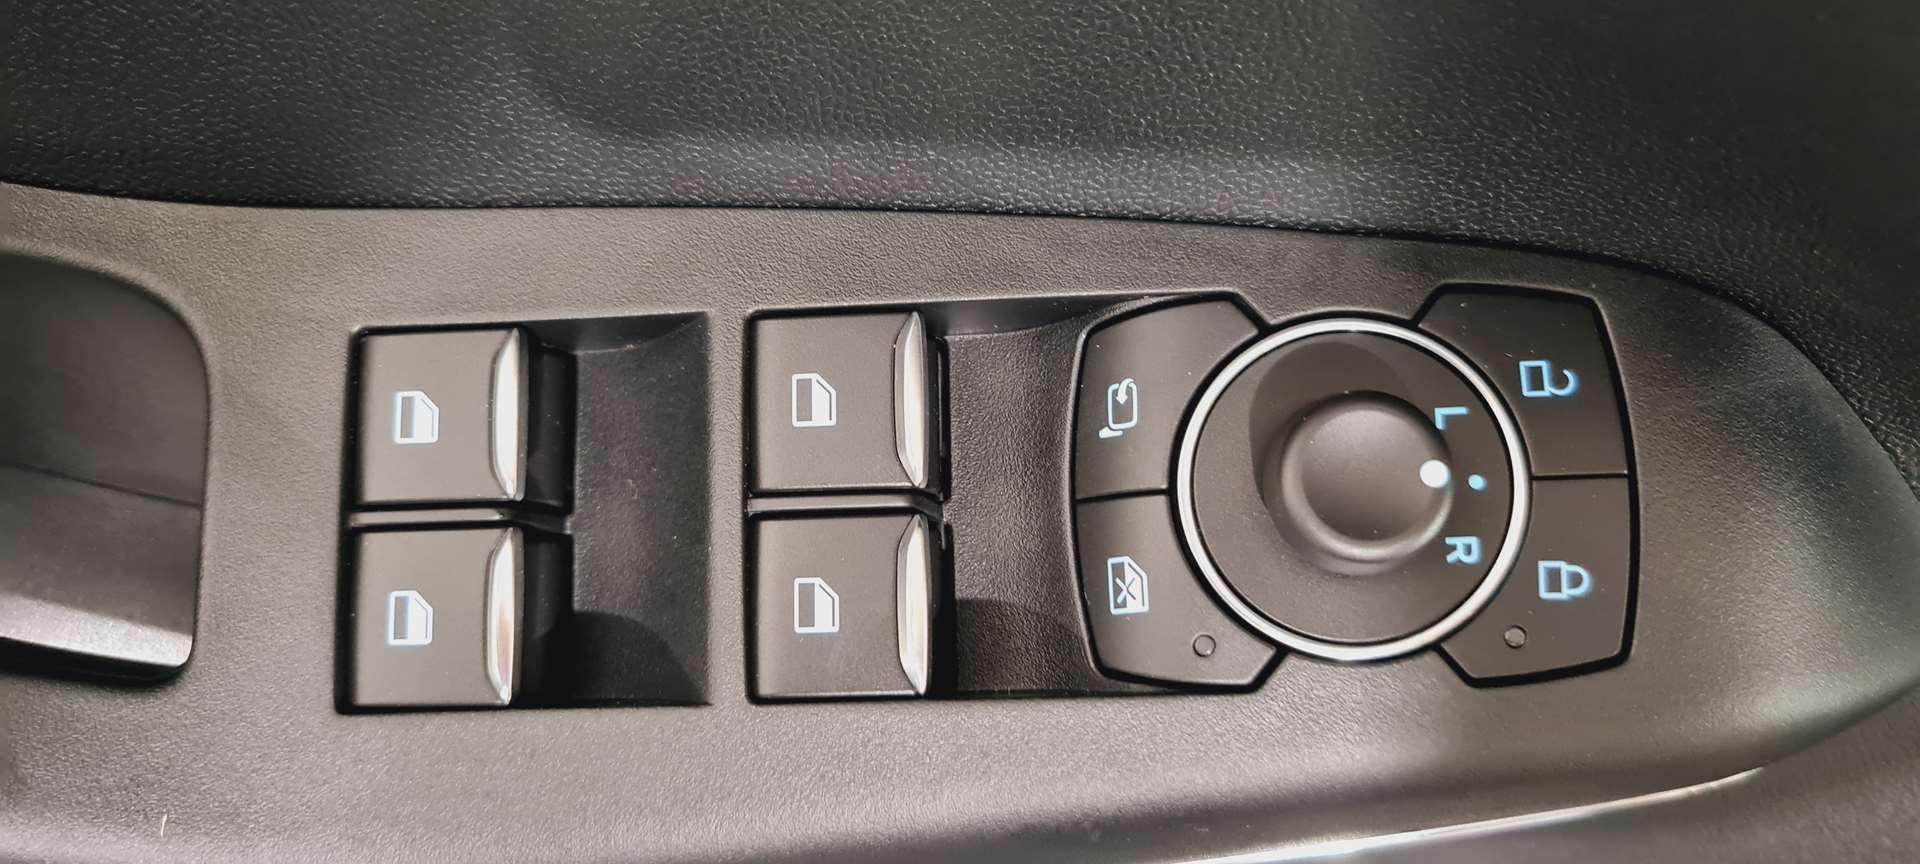 photo FORD PUMA 1.0 EcoBoost 125 ch mHEV S&S DCT7 Titanium